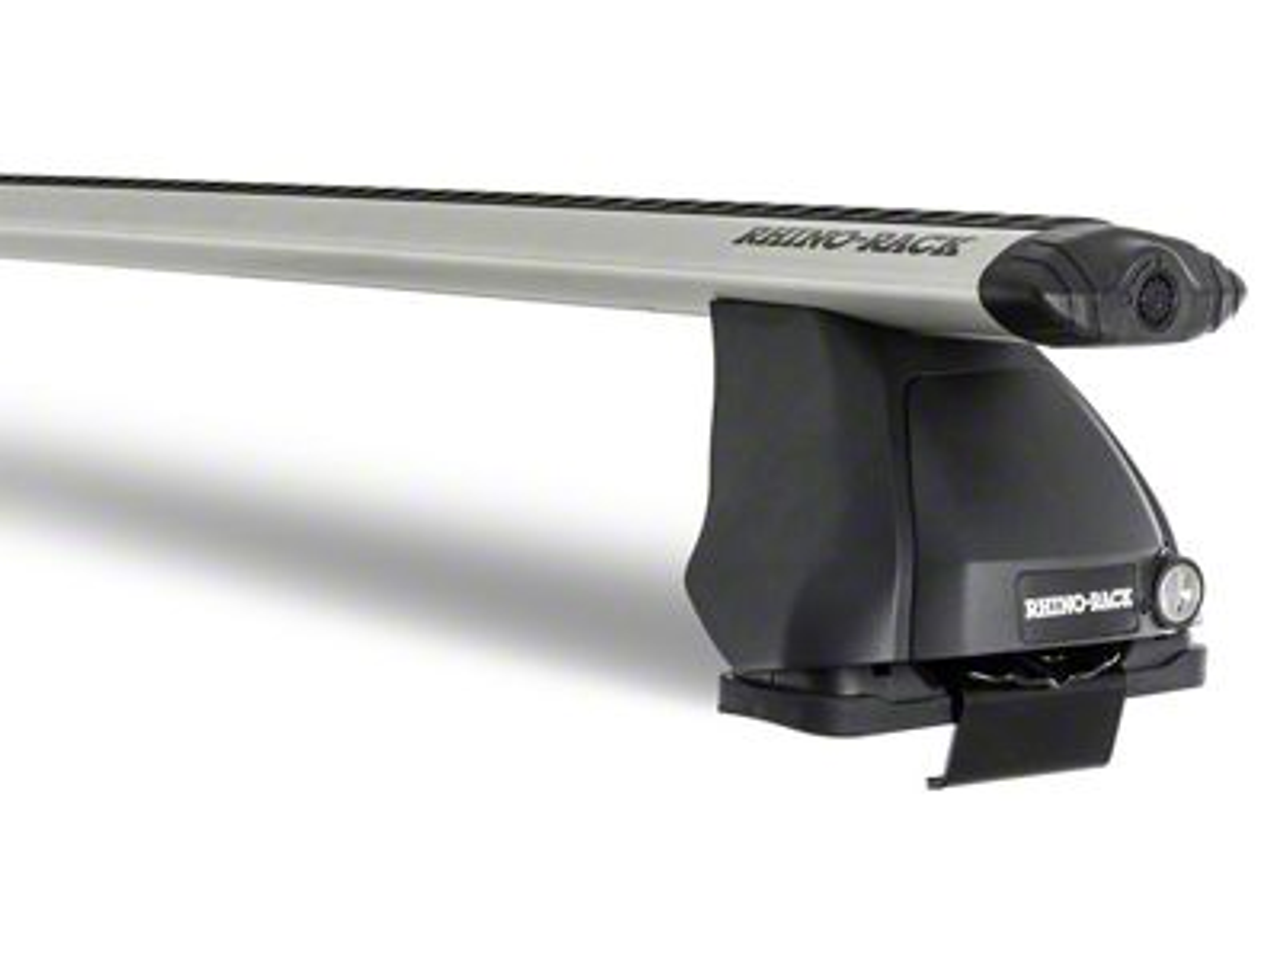 Rhino-Rack Vortex 2500 Front 1-Bar Roof Rack - Silver (14-18 Sierra 1500 Double Cab, Crew Cab)